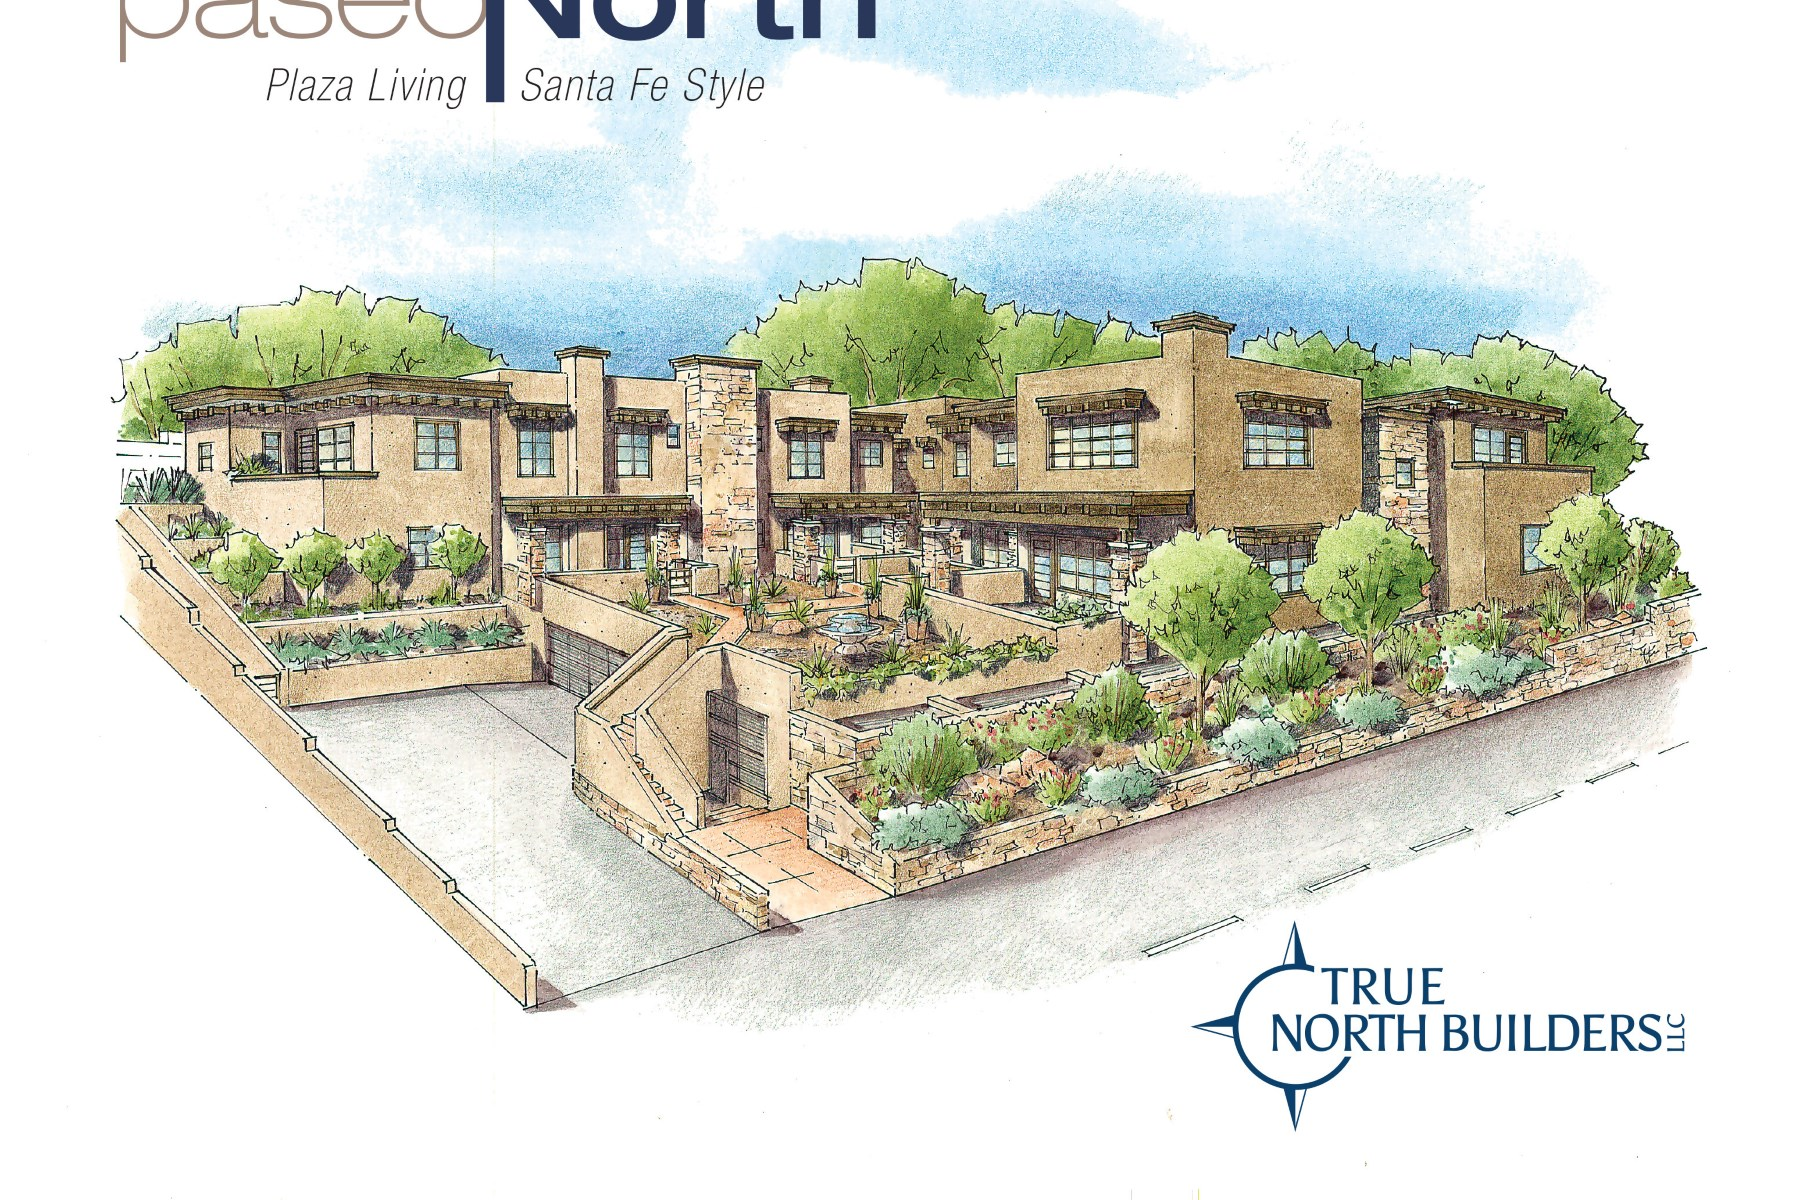 Condominium for Sale at 511 Paseo De Peralta #2 Santa Fe City Northeast, Santa Fe, New Mexico 87501 United States